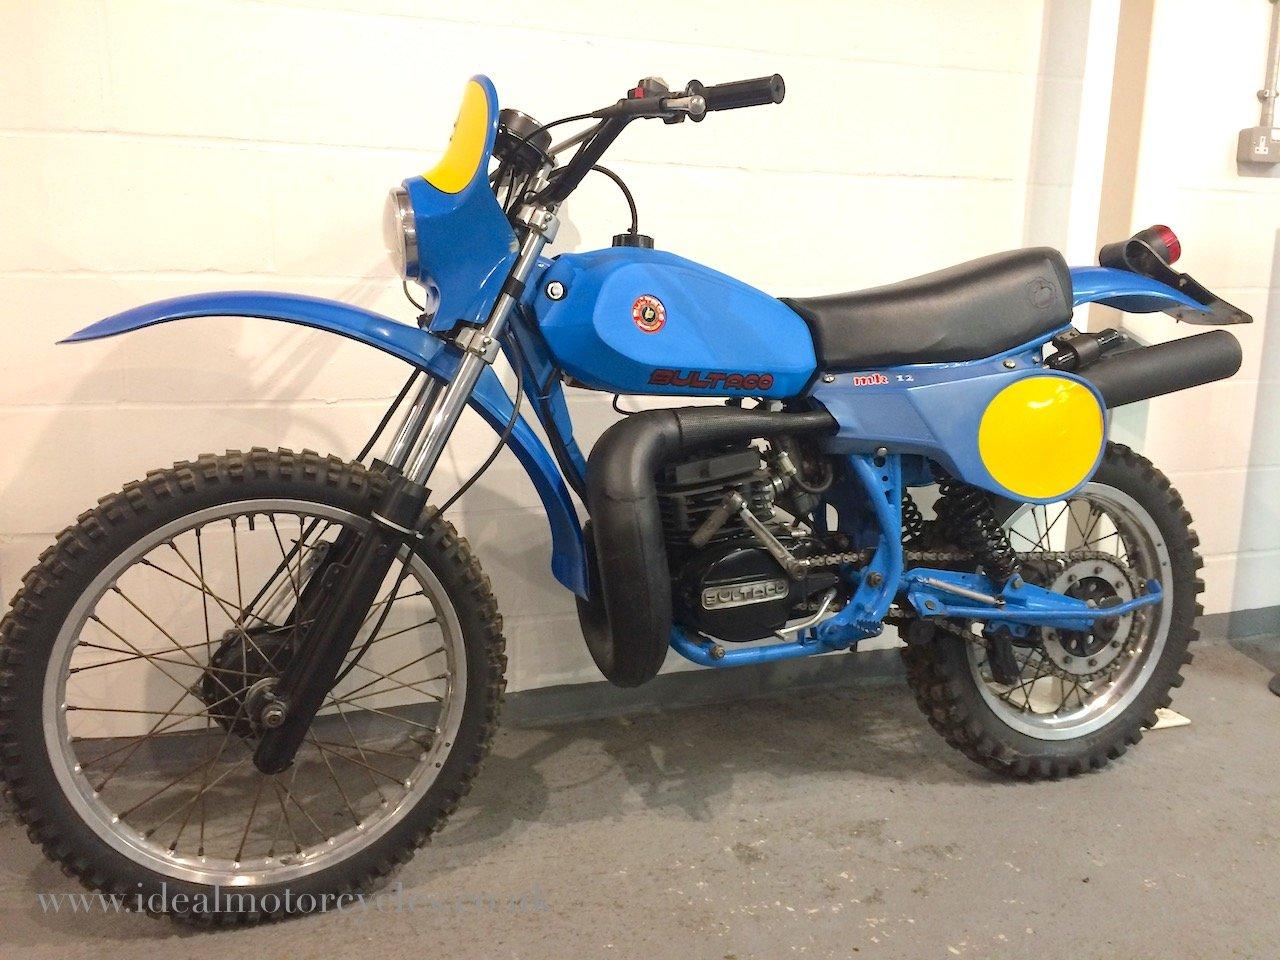 1981 Bultaco Pursang Mk12TT For Sale (picture 7 of 7)